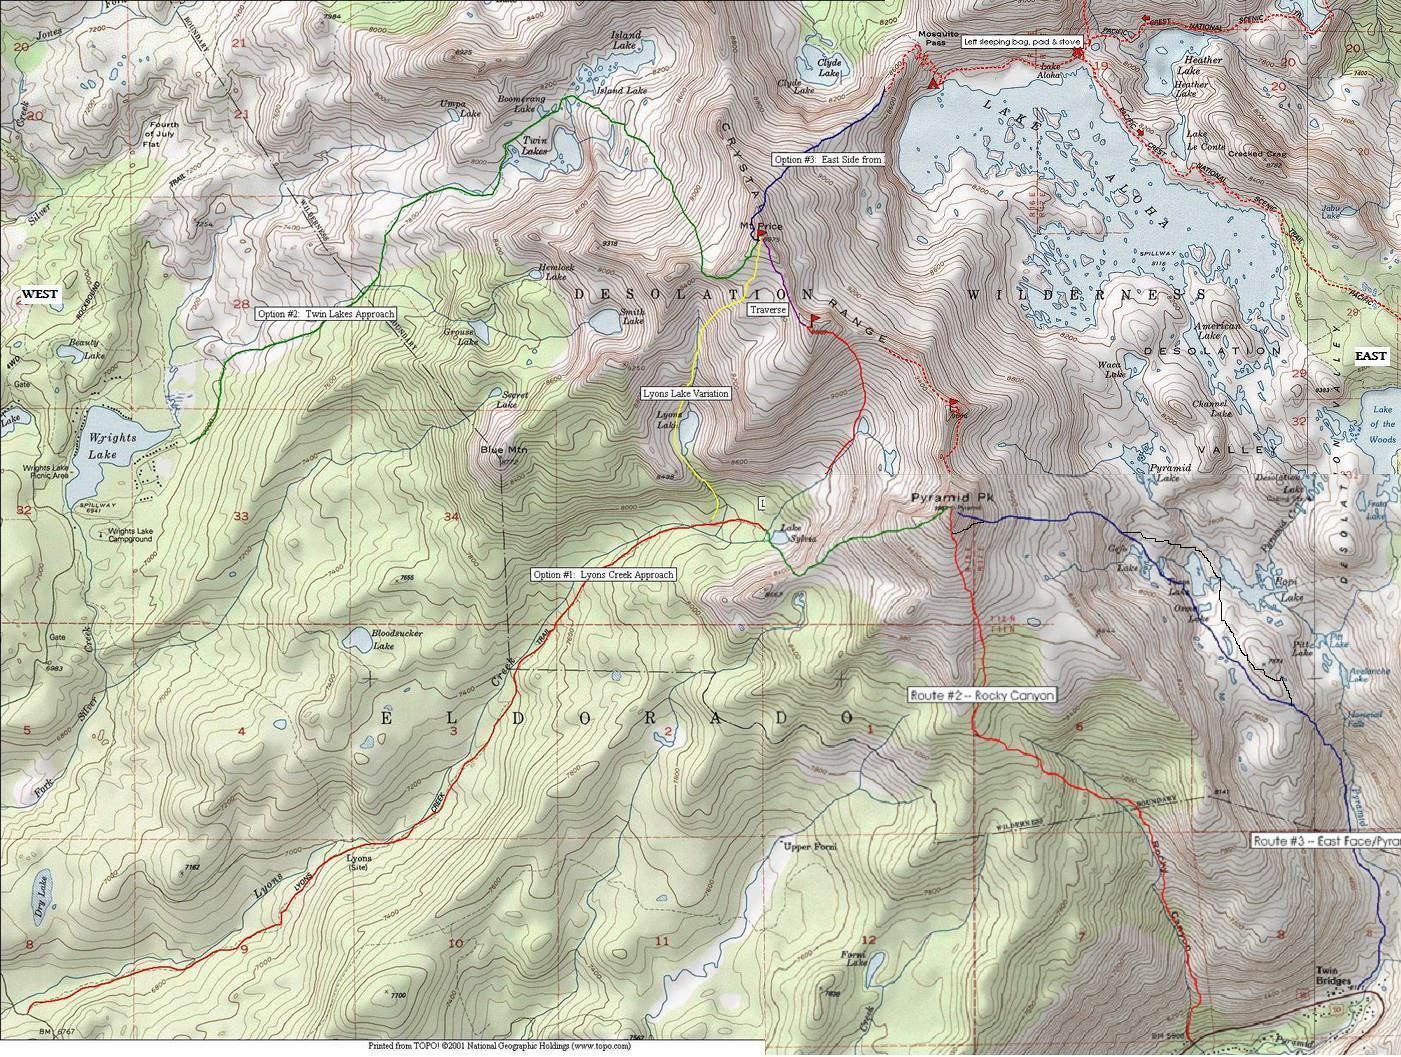 on desolation wilderness map